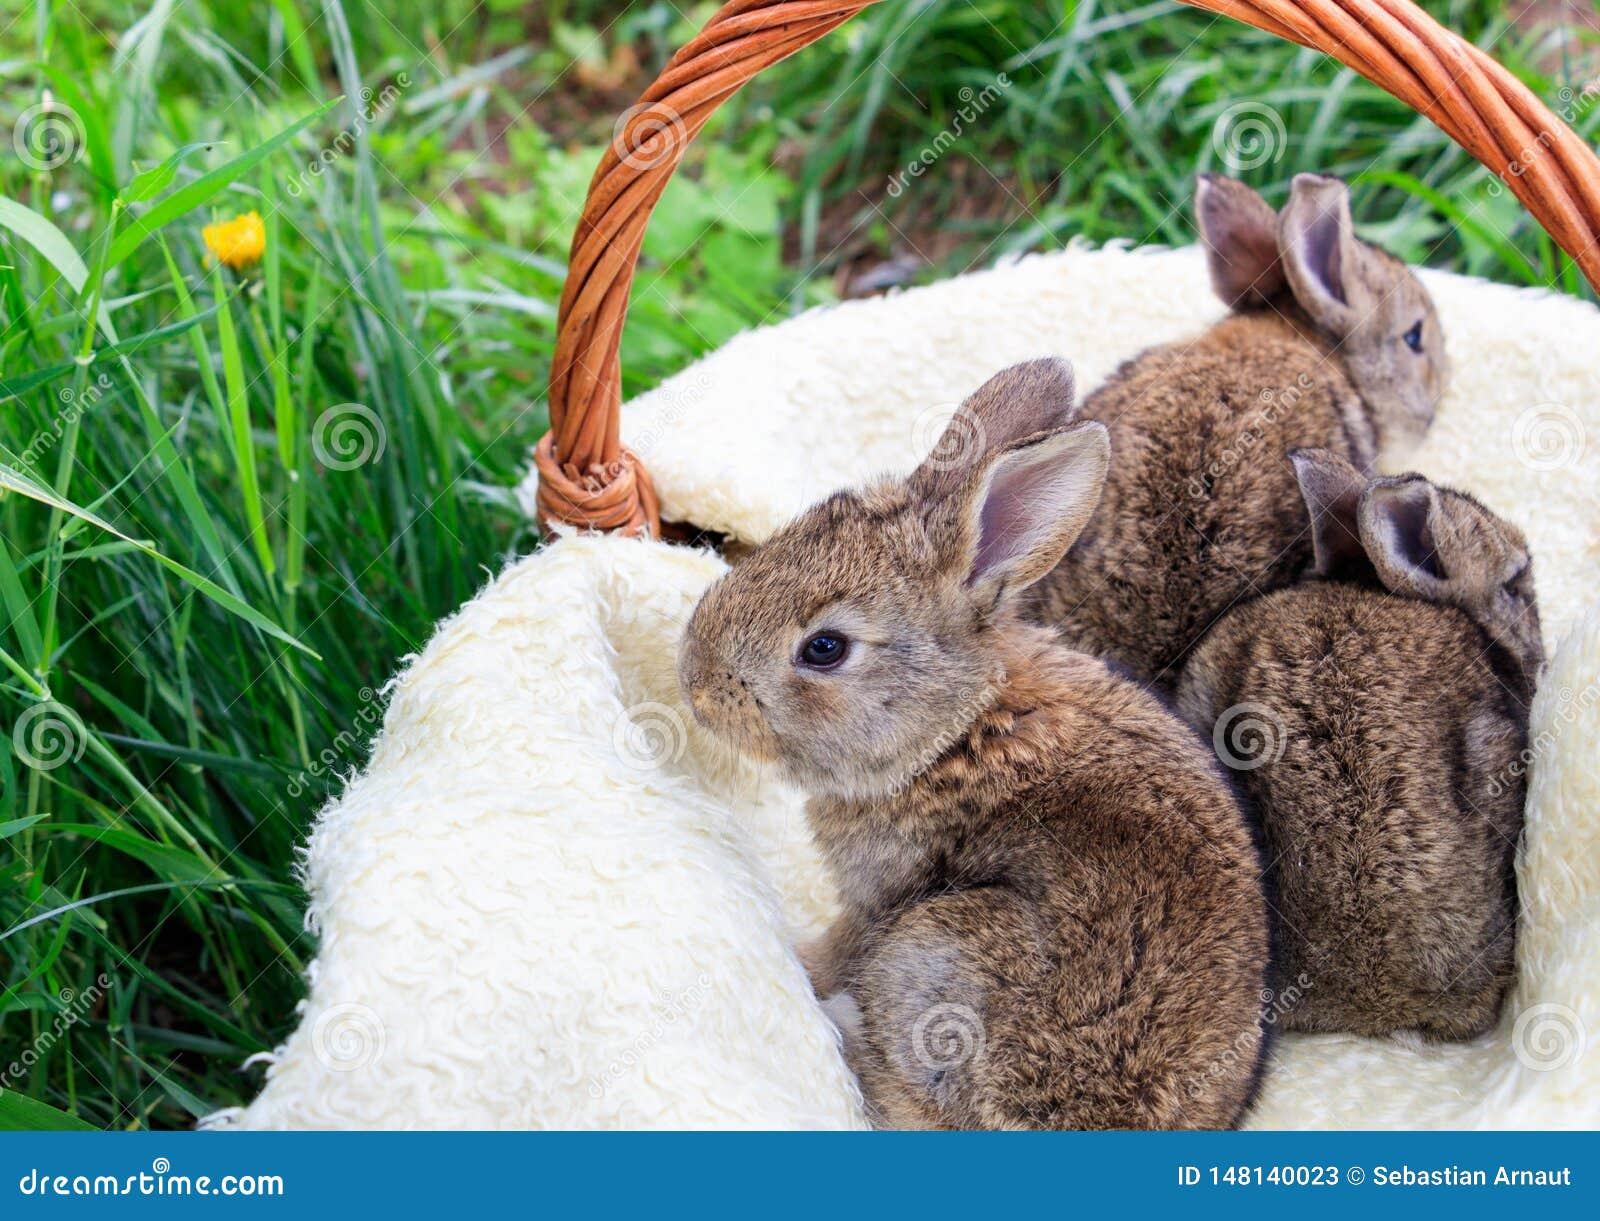 Three small and beautiful bunnies